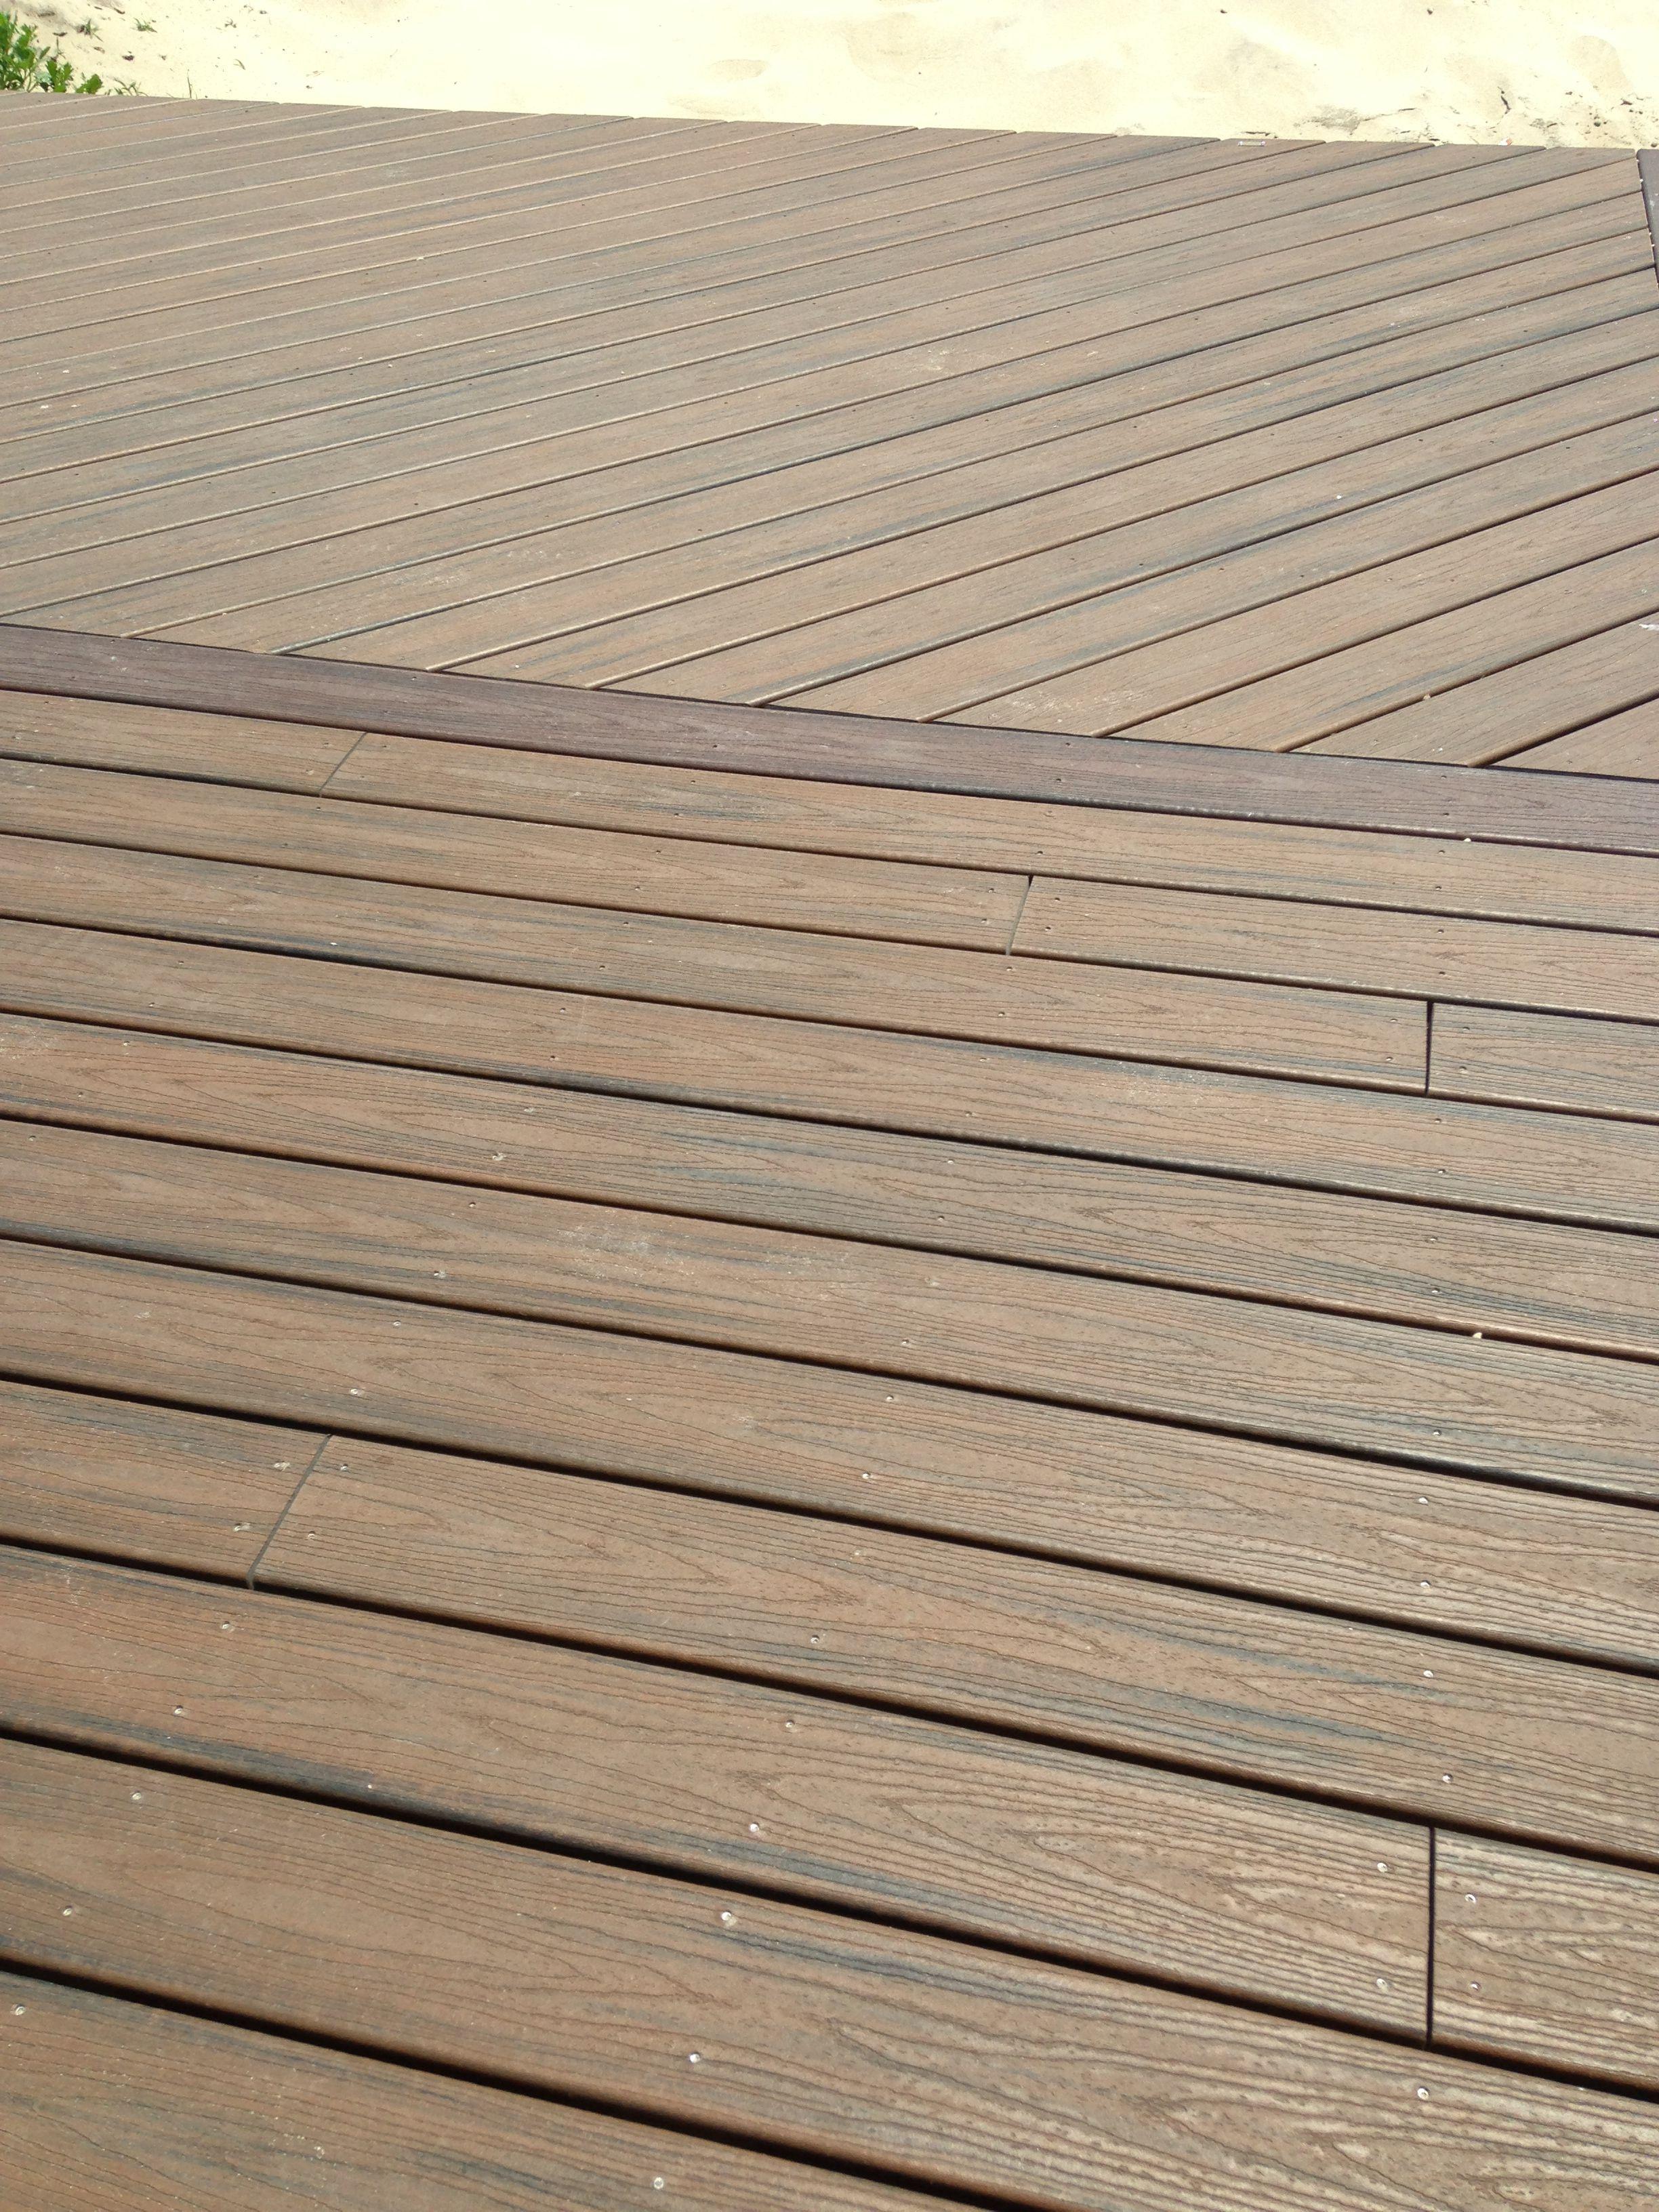 New boardwalk belmar nj belmar iphone photography